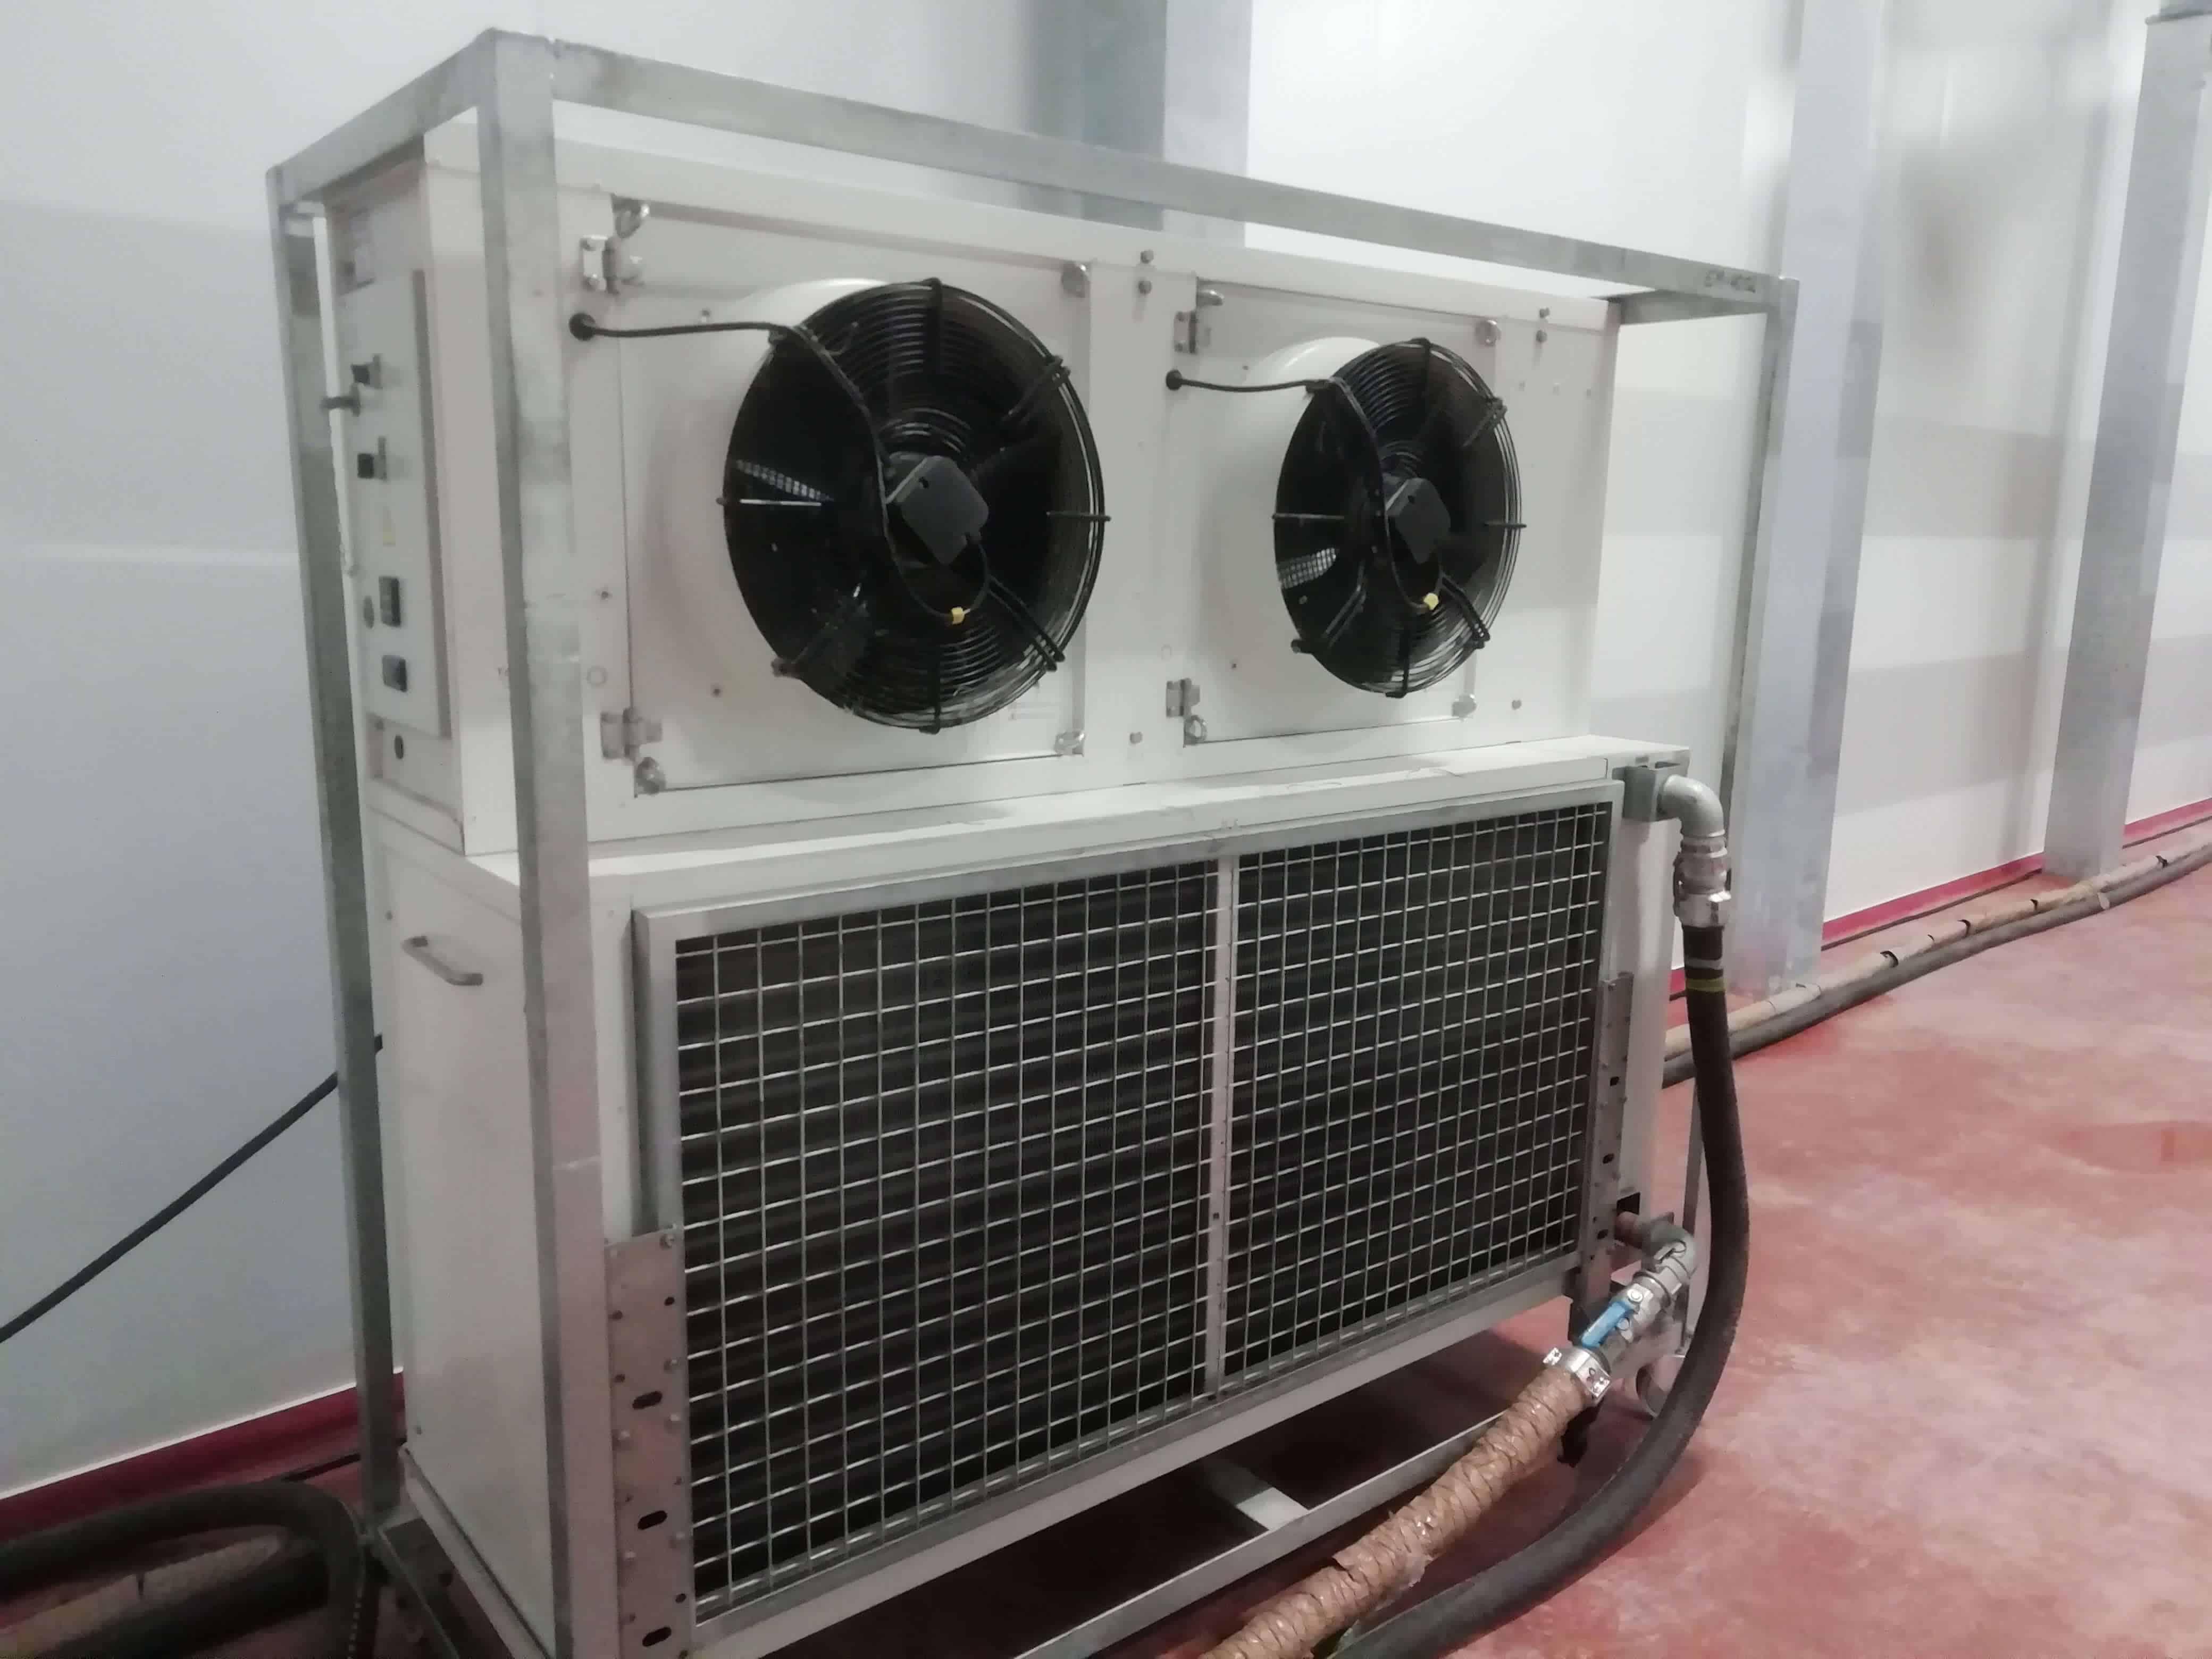 Alquiler de evaporadores cámaras frigoríficas